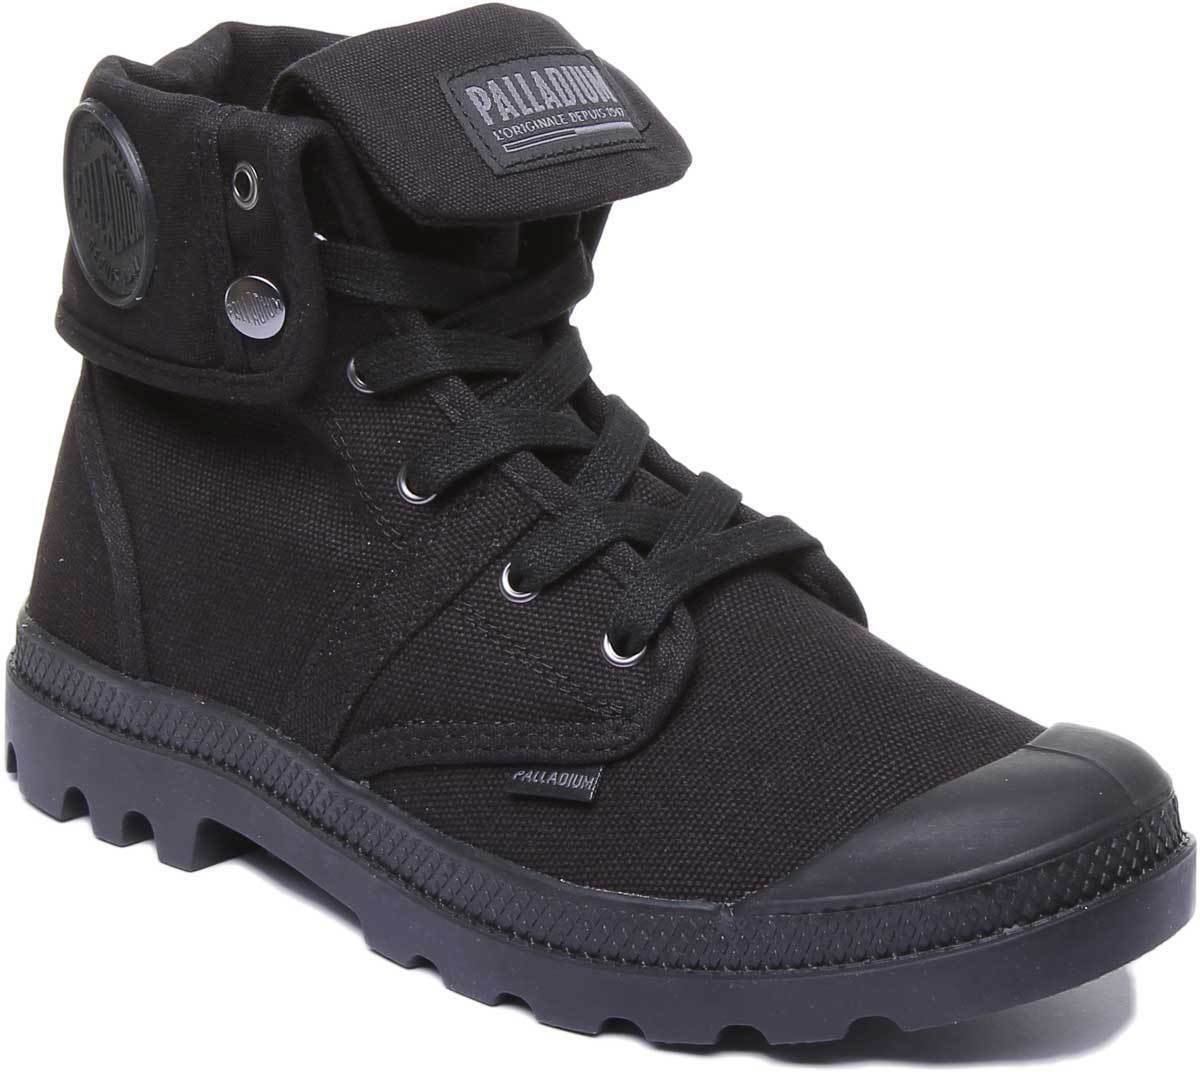 Palladium Pallabrouse Holgado Hombre Lona Negra Mono Hi Top botas tamaño de Reino Unido 6 - 12